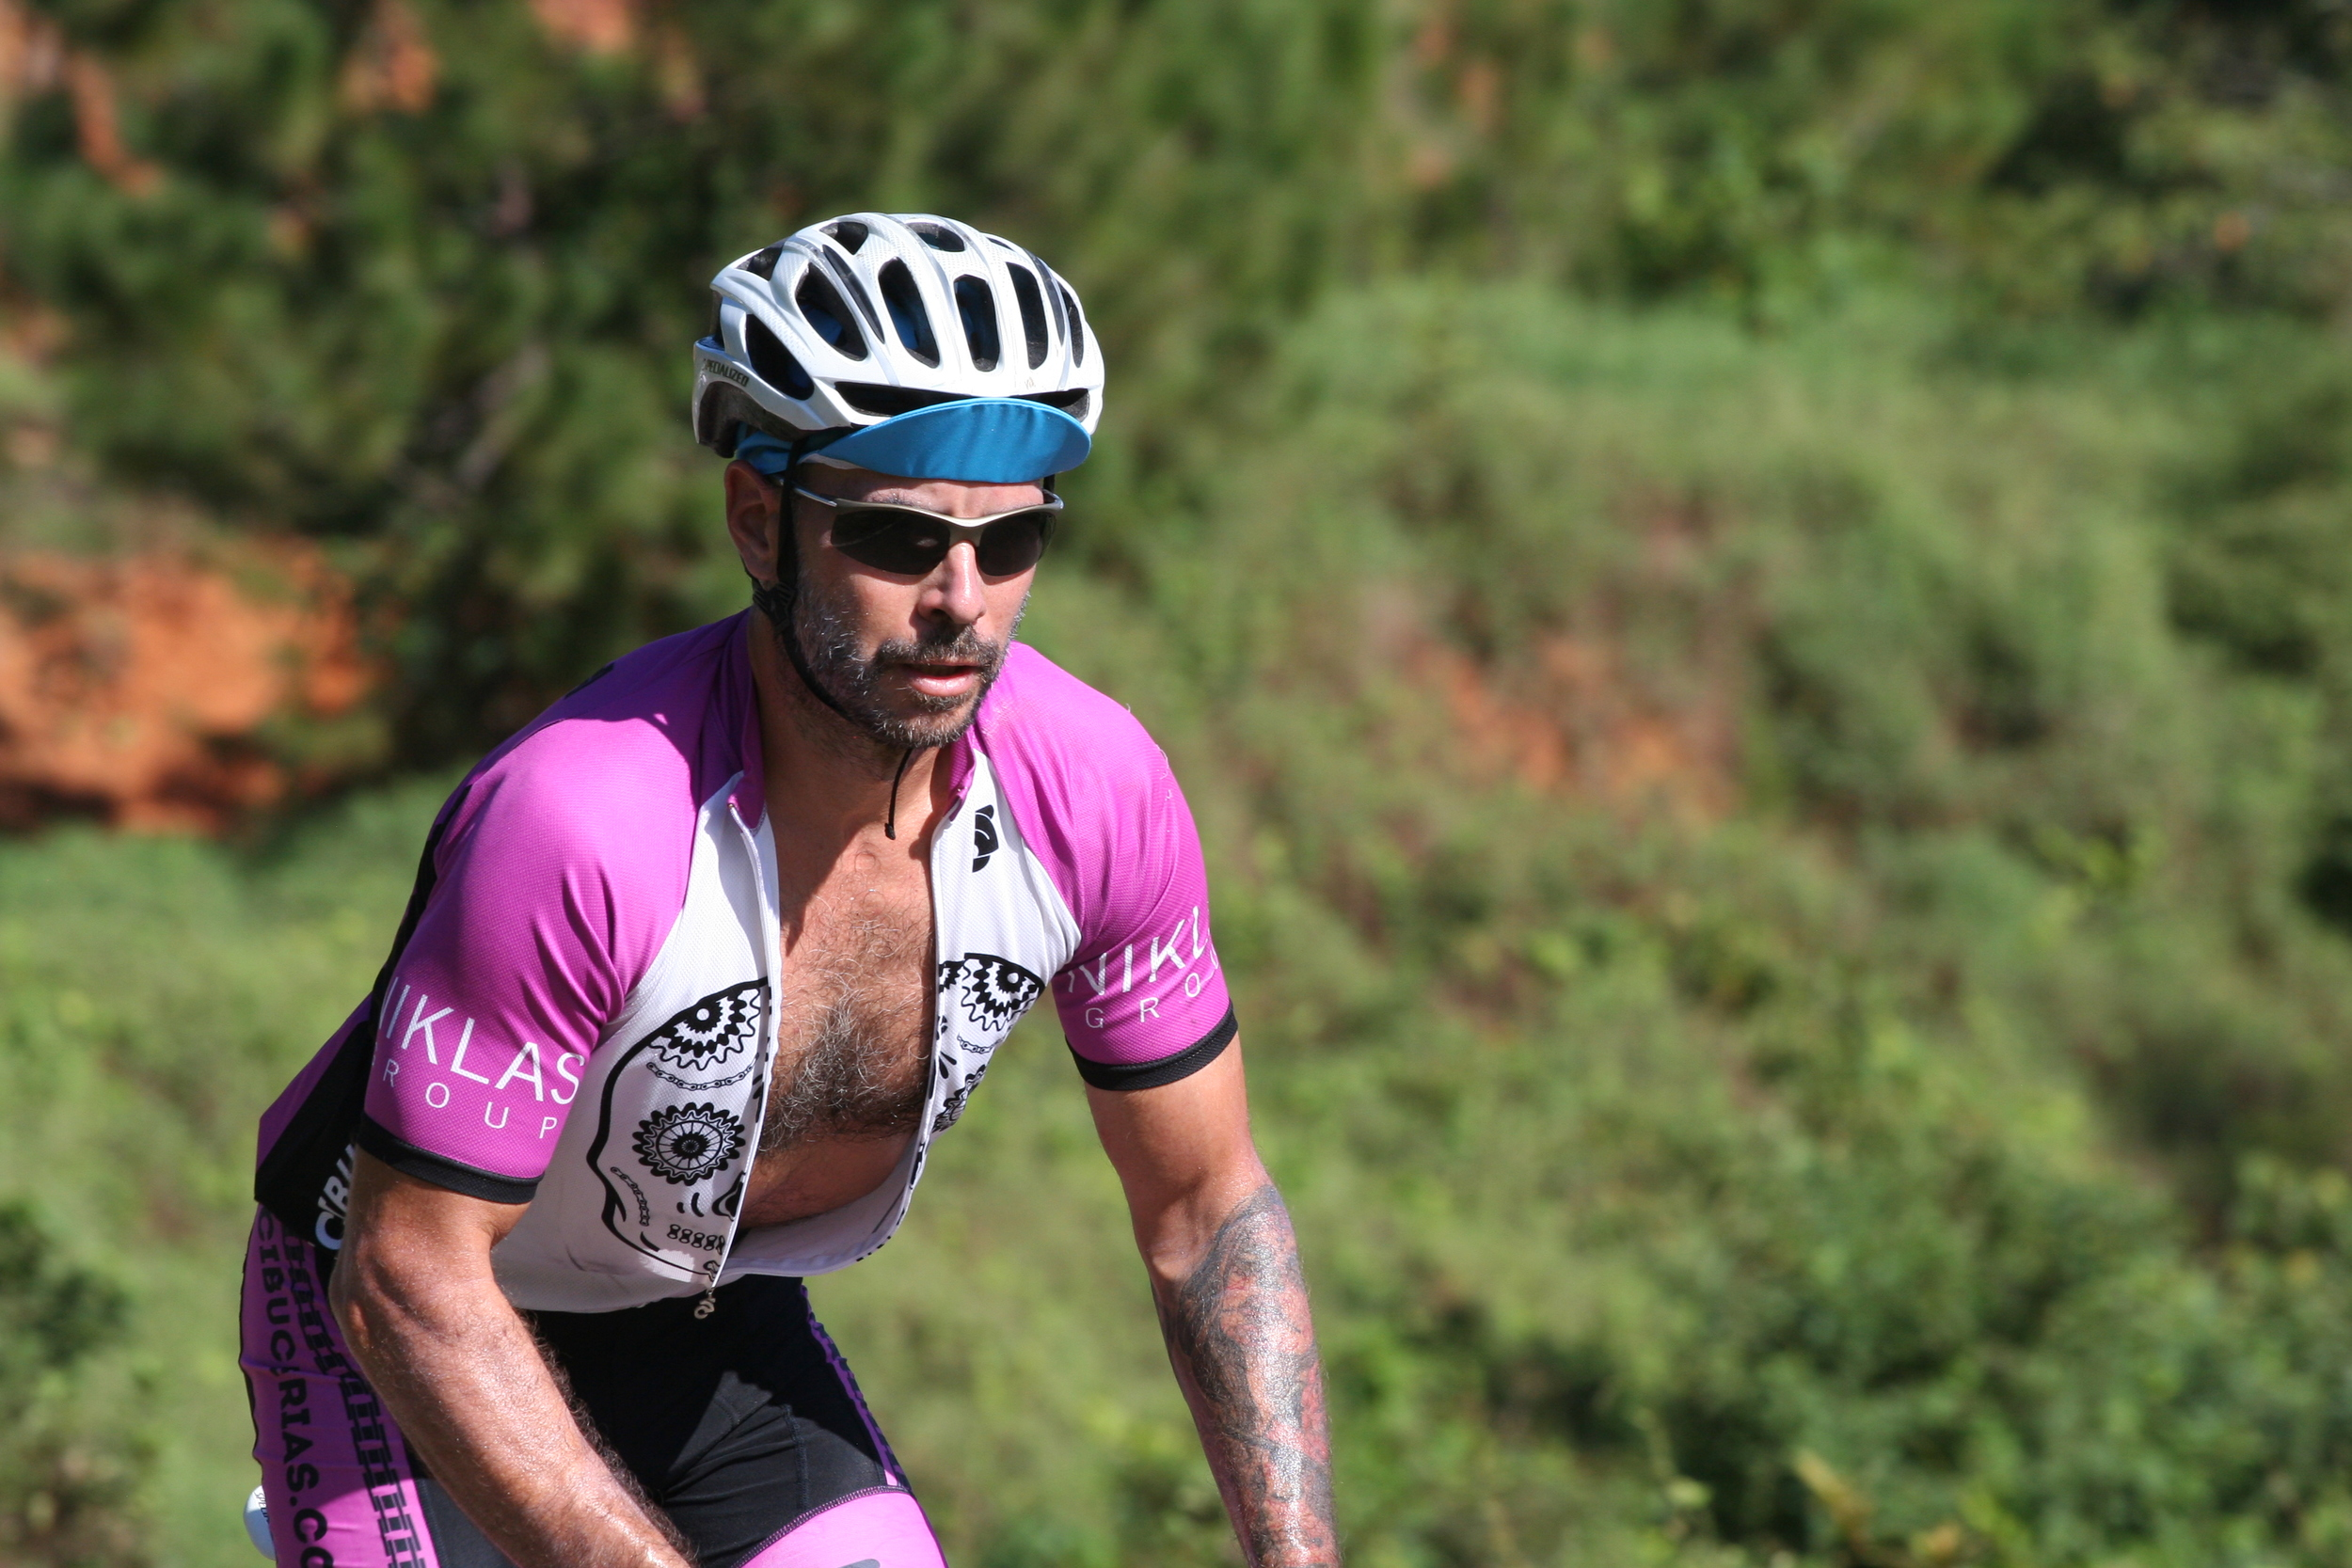 joel goralski - guía lider & fundador de bici bucerias